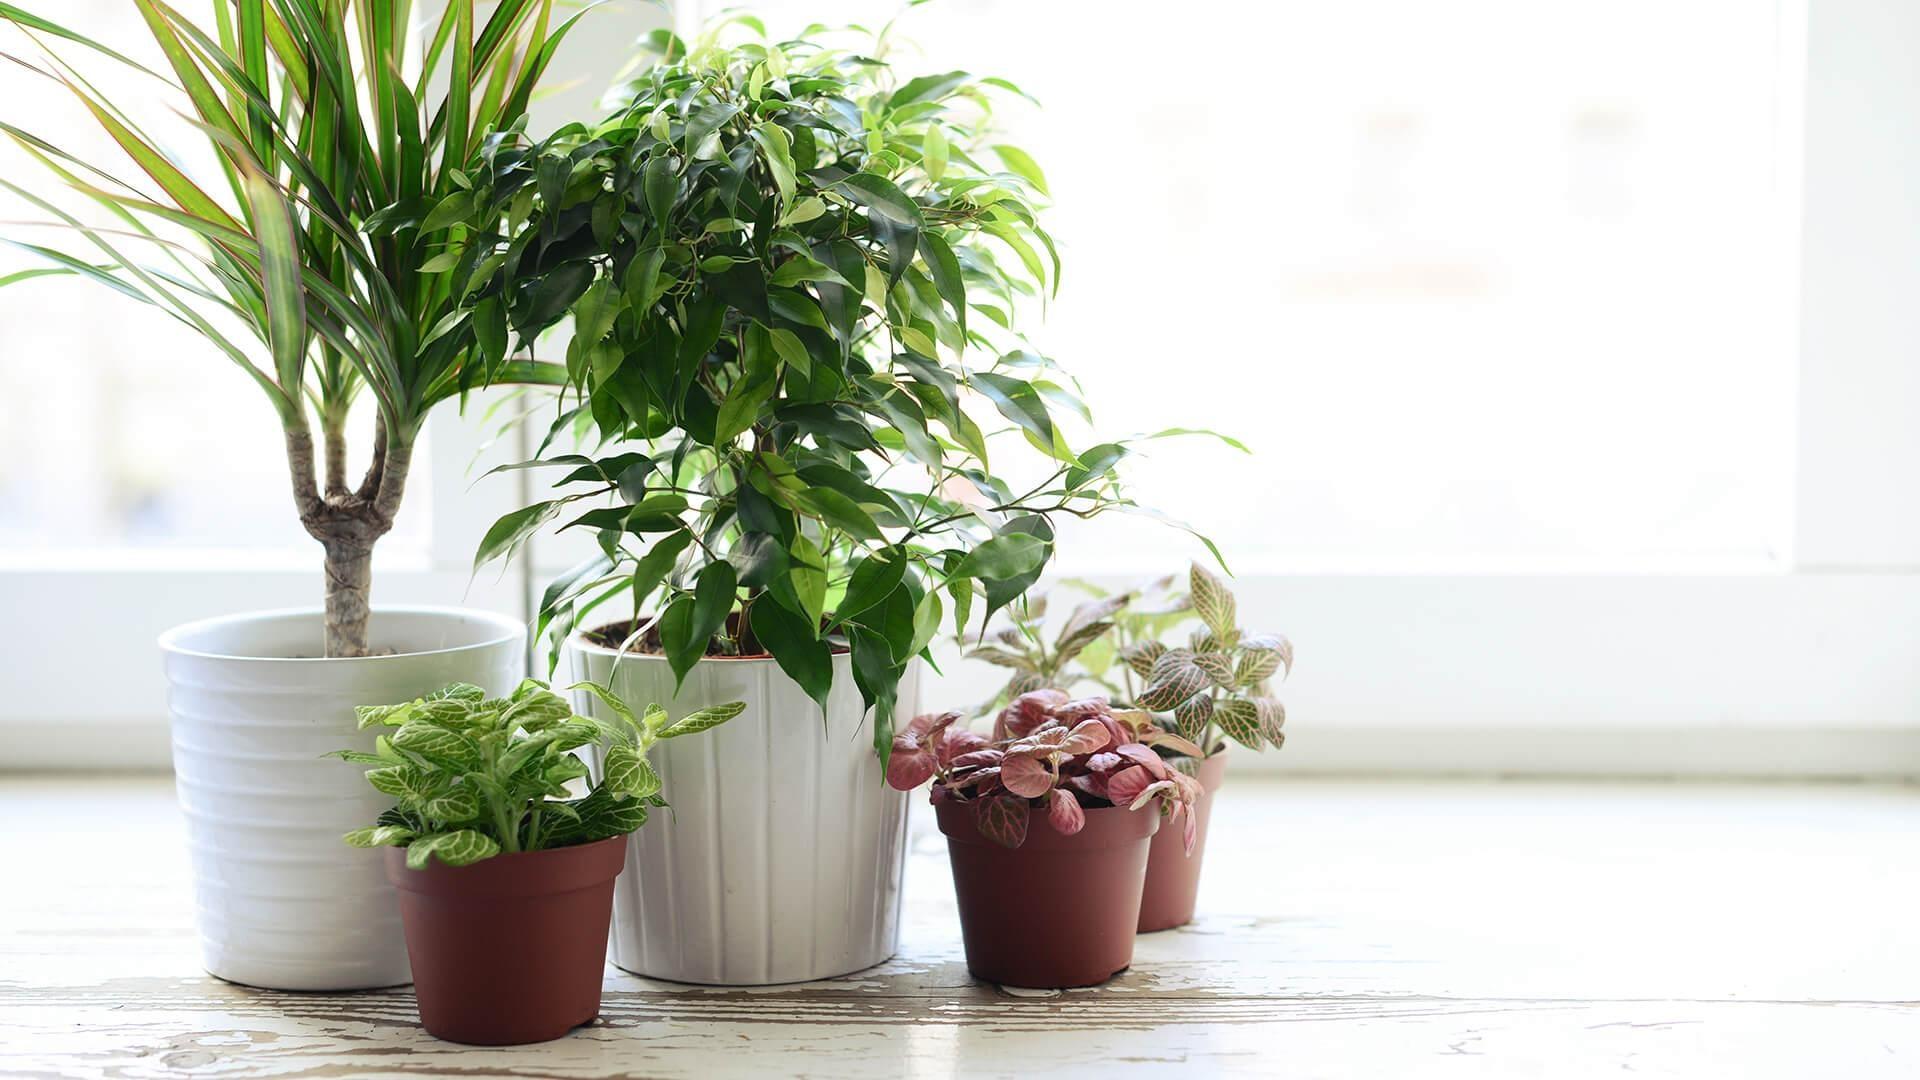 Houseplants hd background